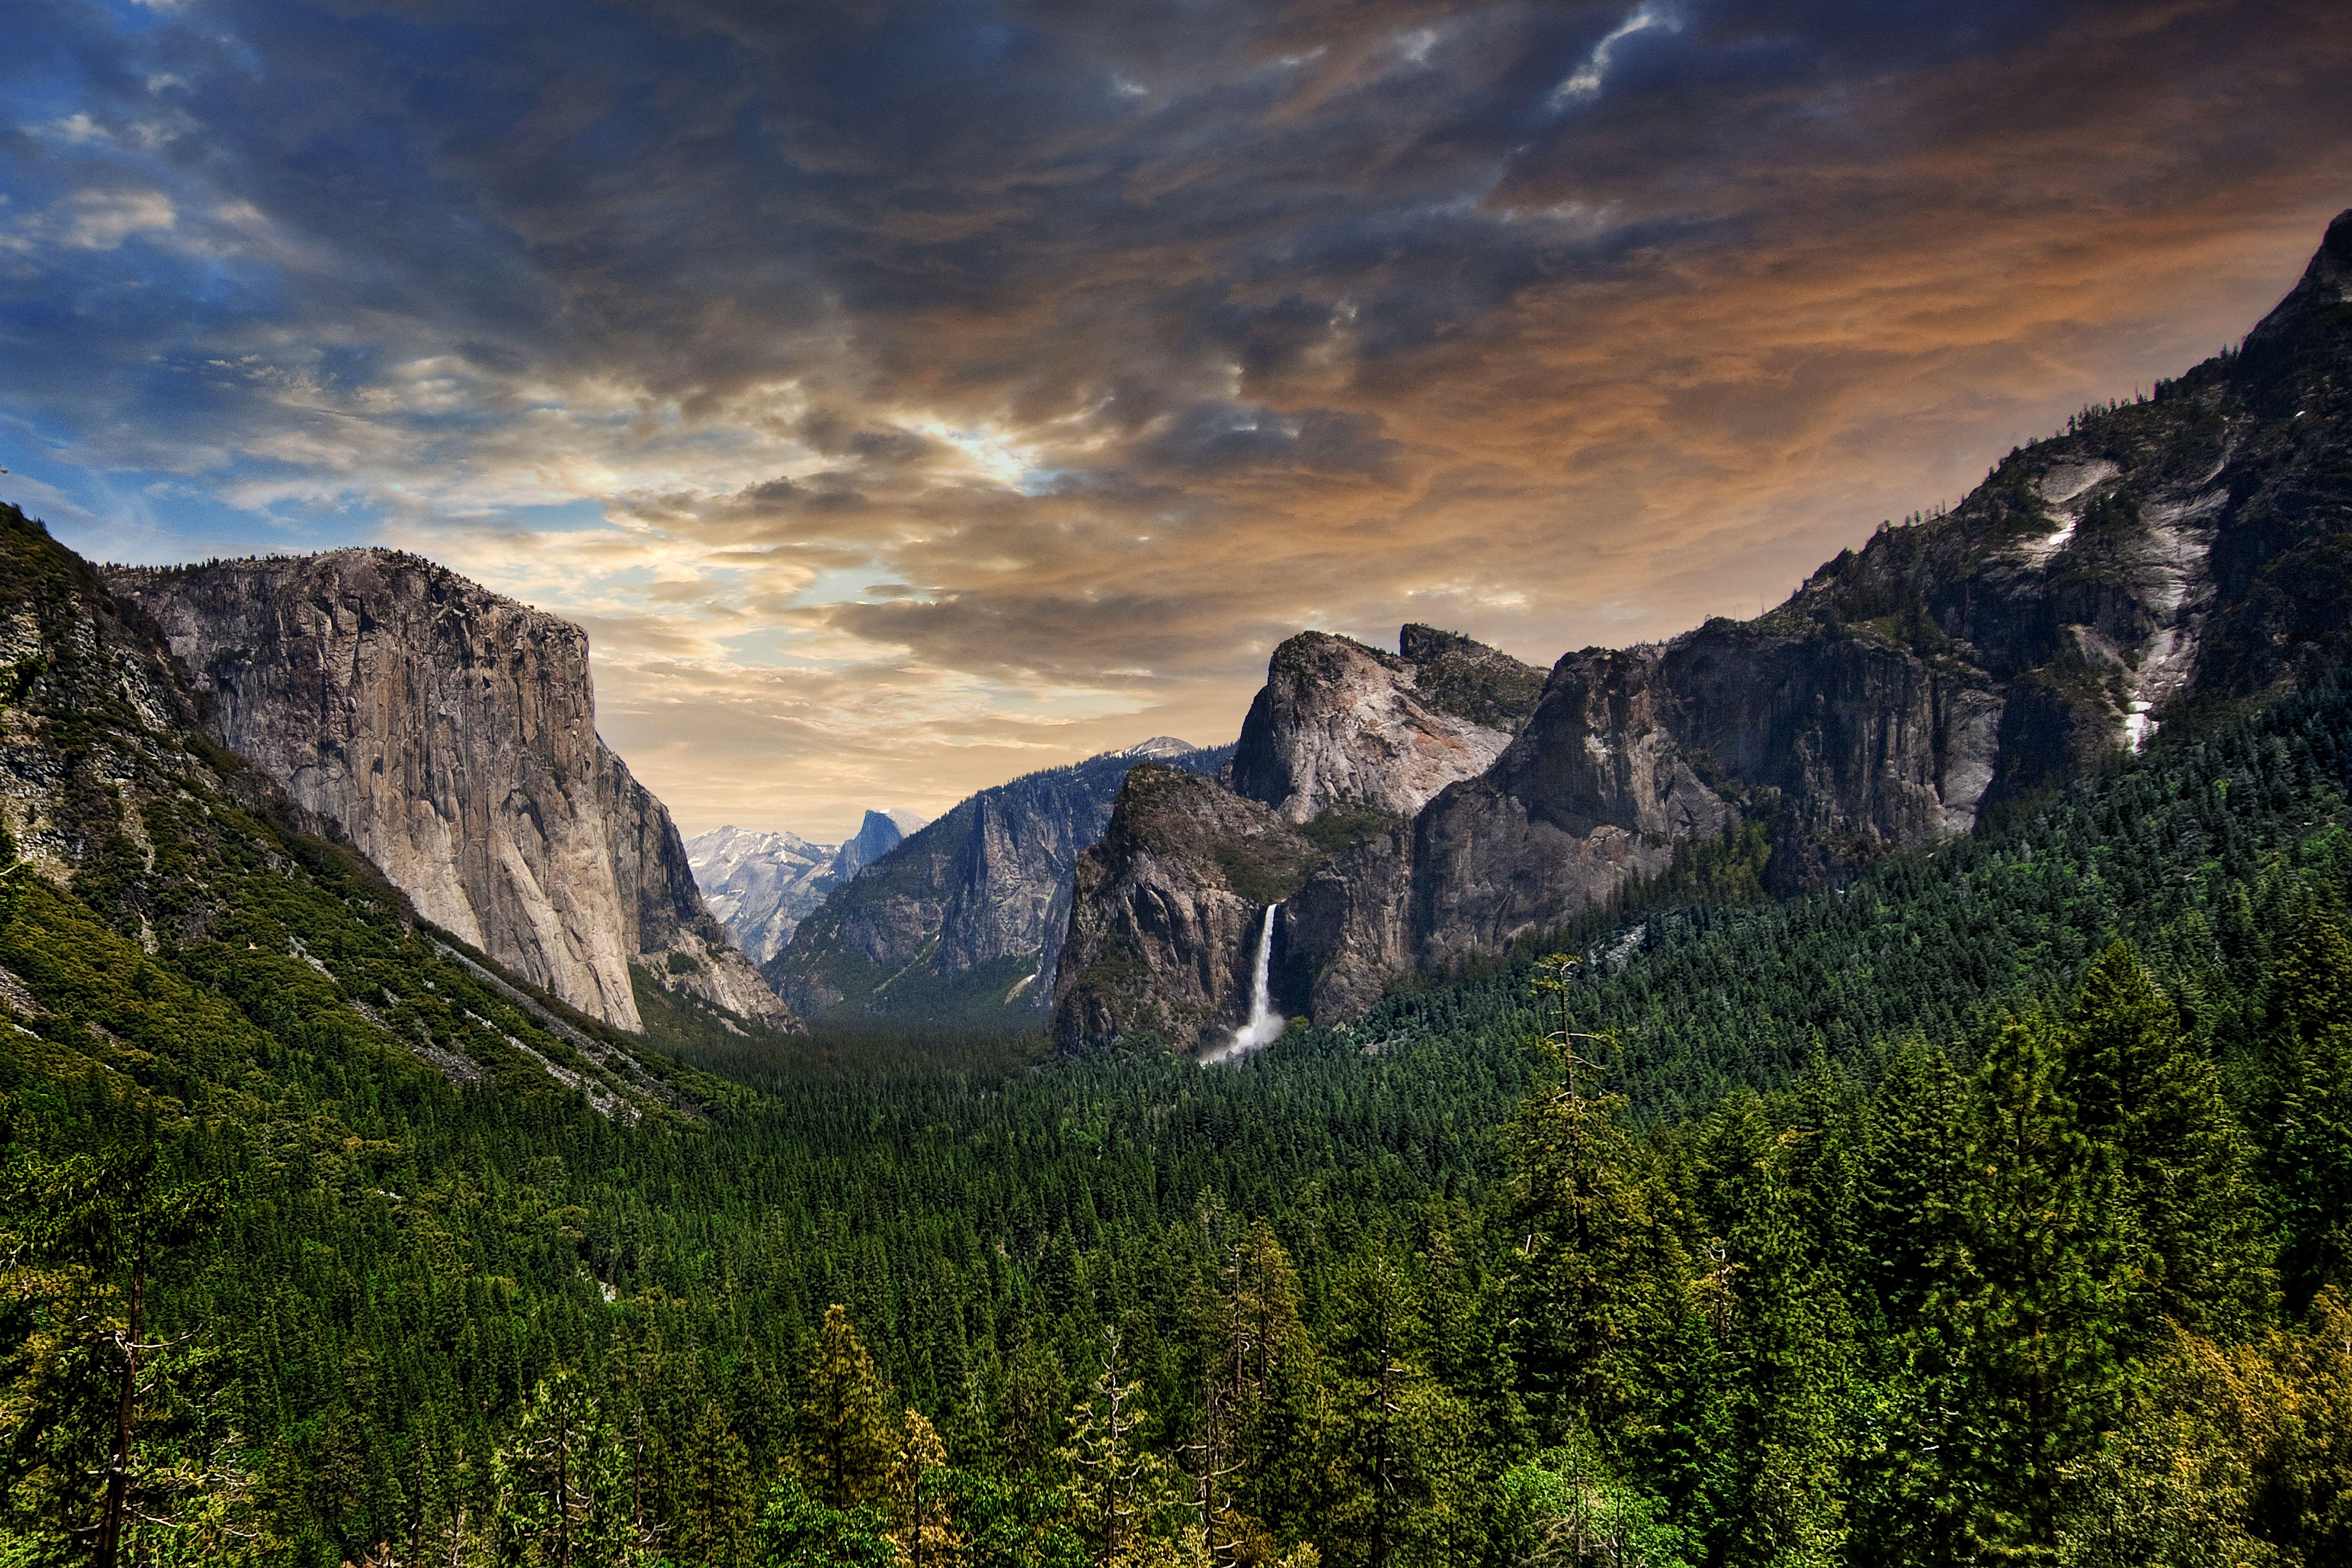 Yosemite Valley Hiking Tips And Tricks Found The World Yosemite National Park Yosemite Photos Yosemite